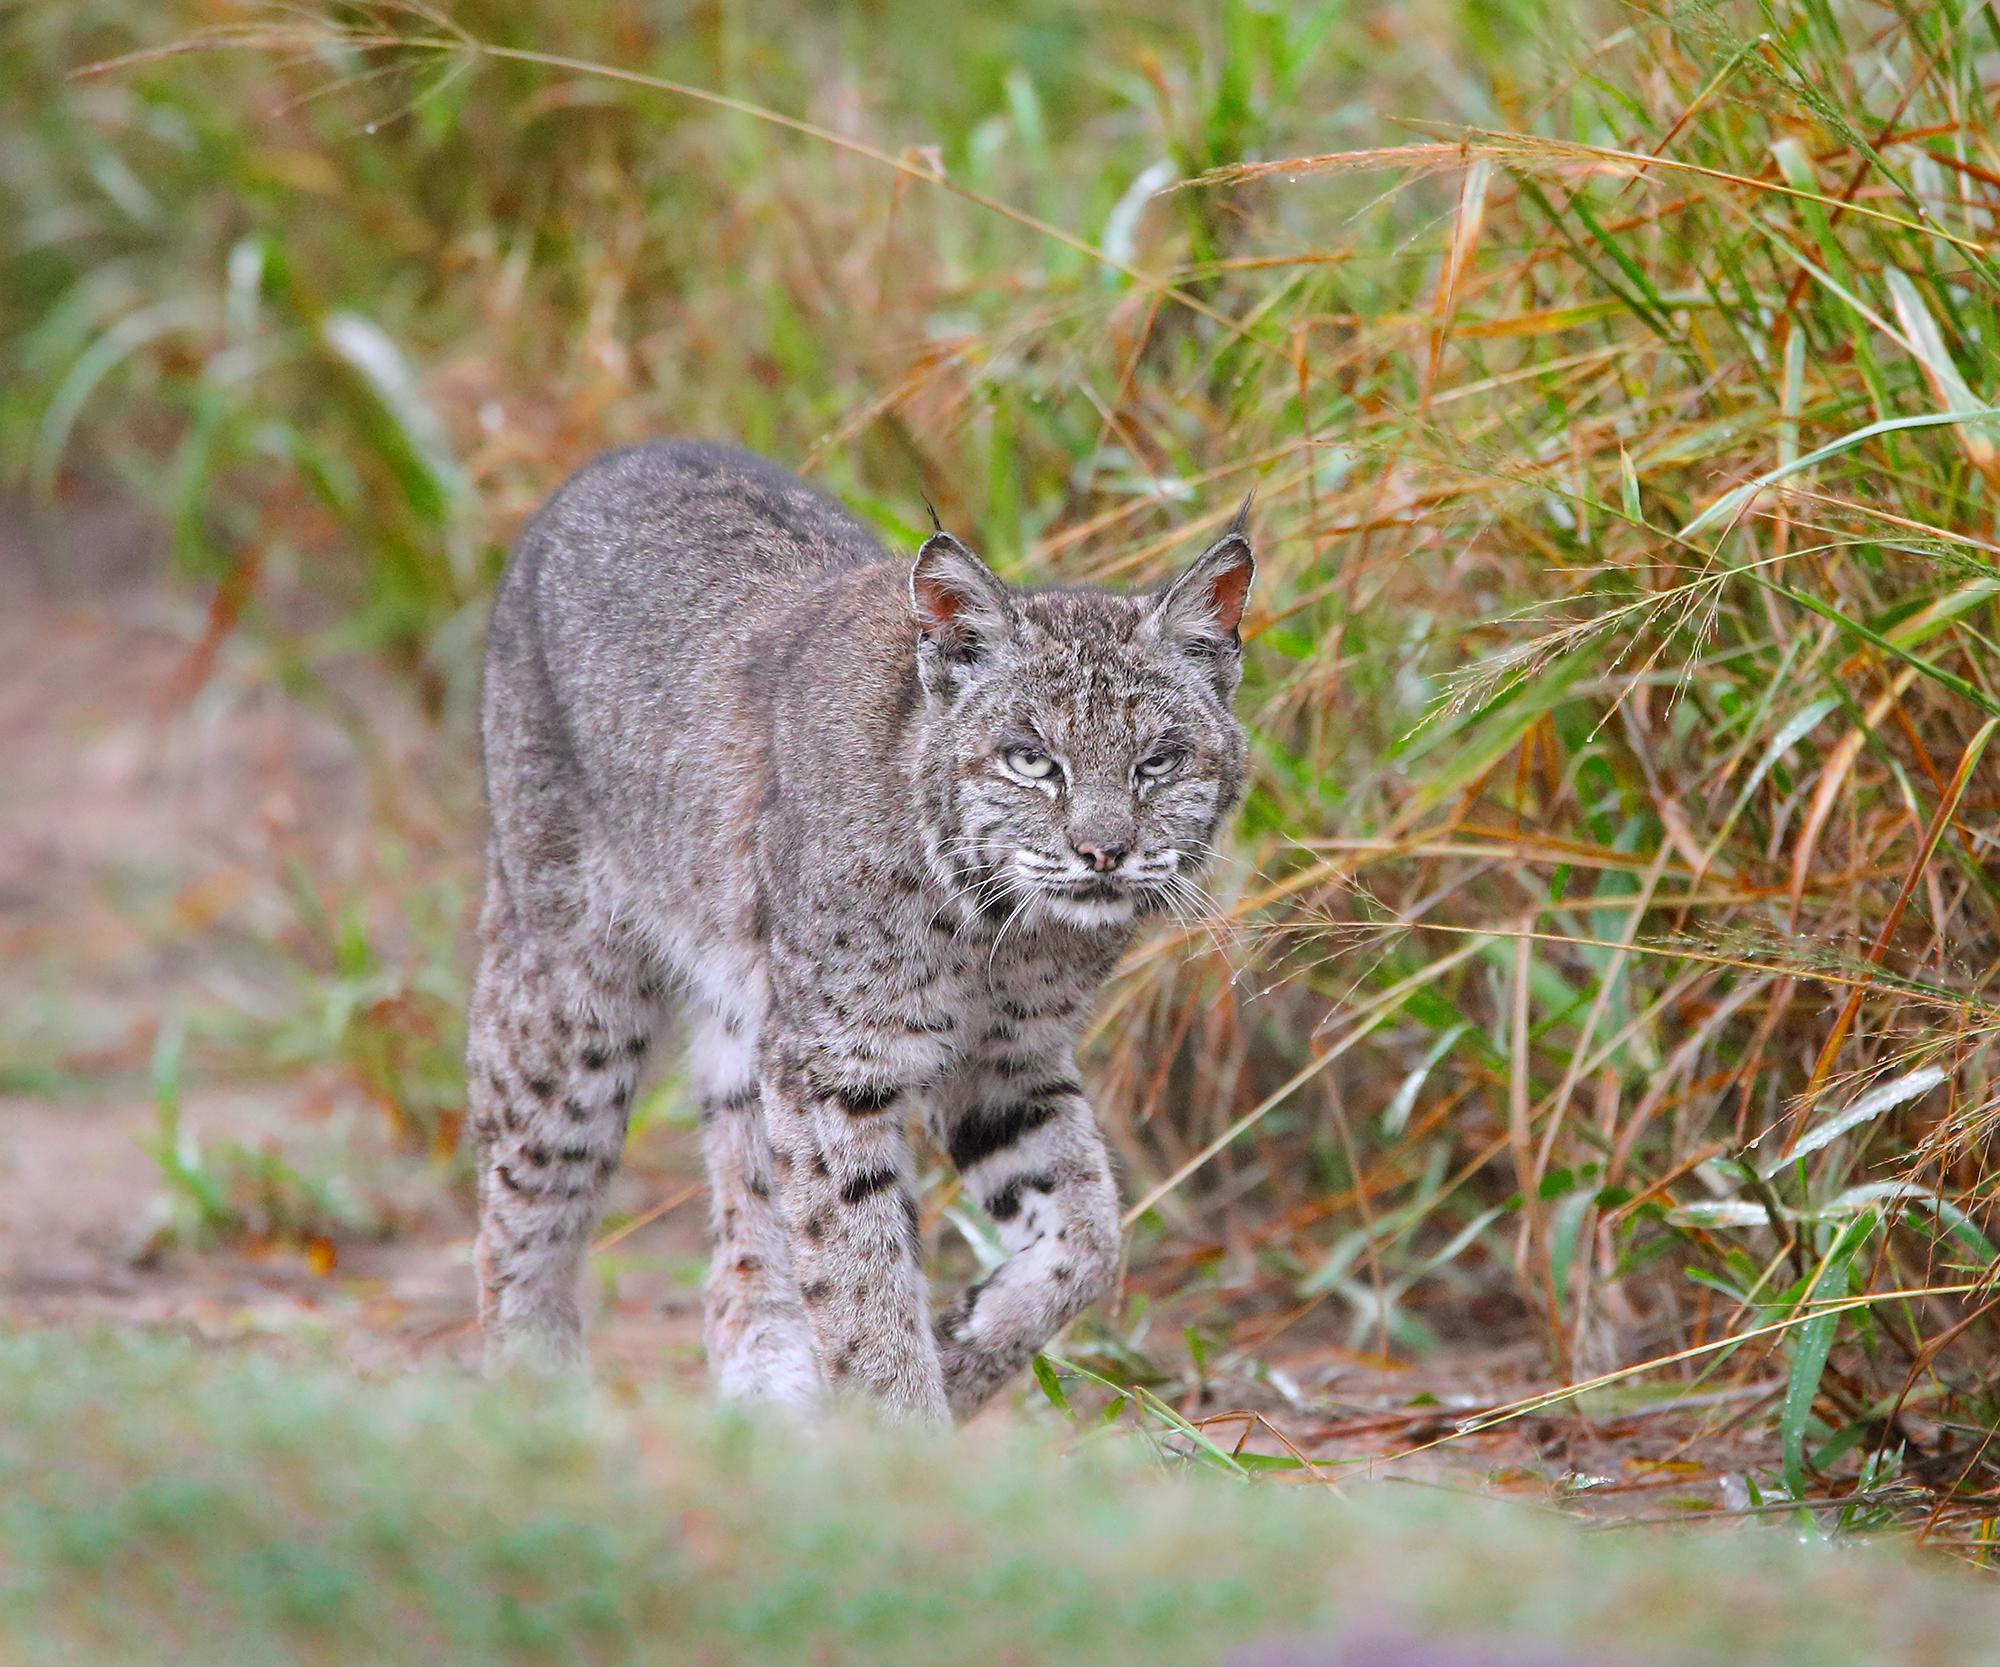 13. Bobcat, off Bensten Rio Grande Valley State Park, Texas